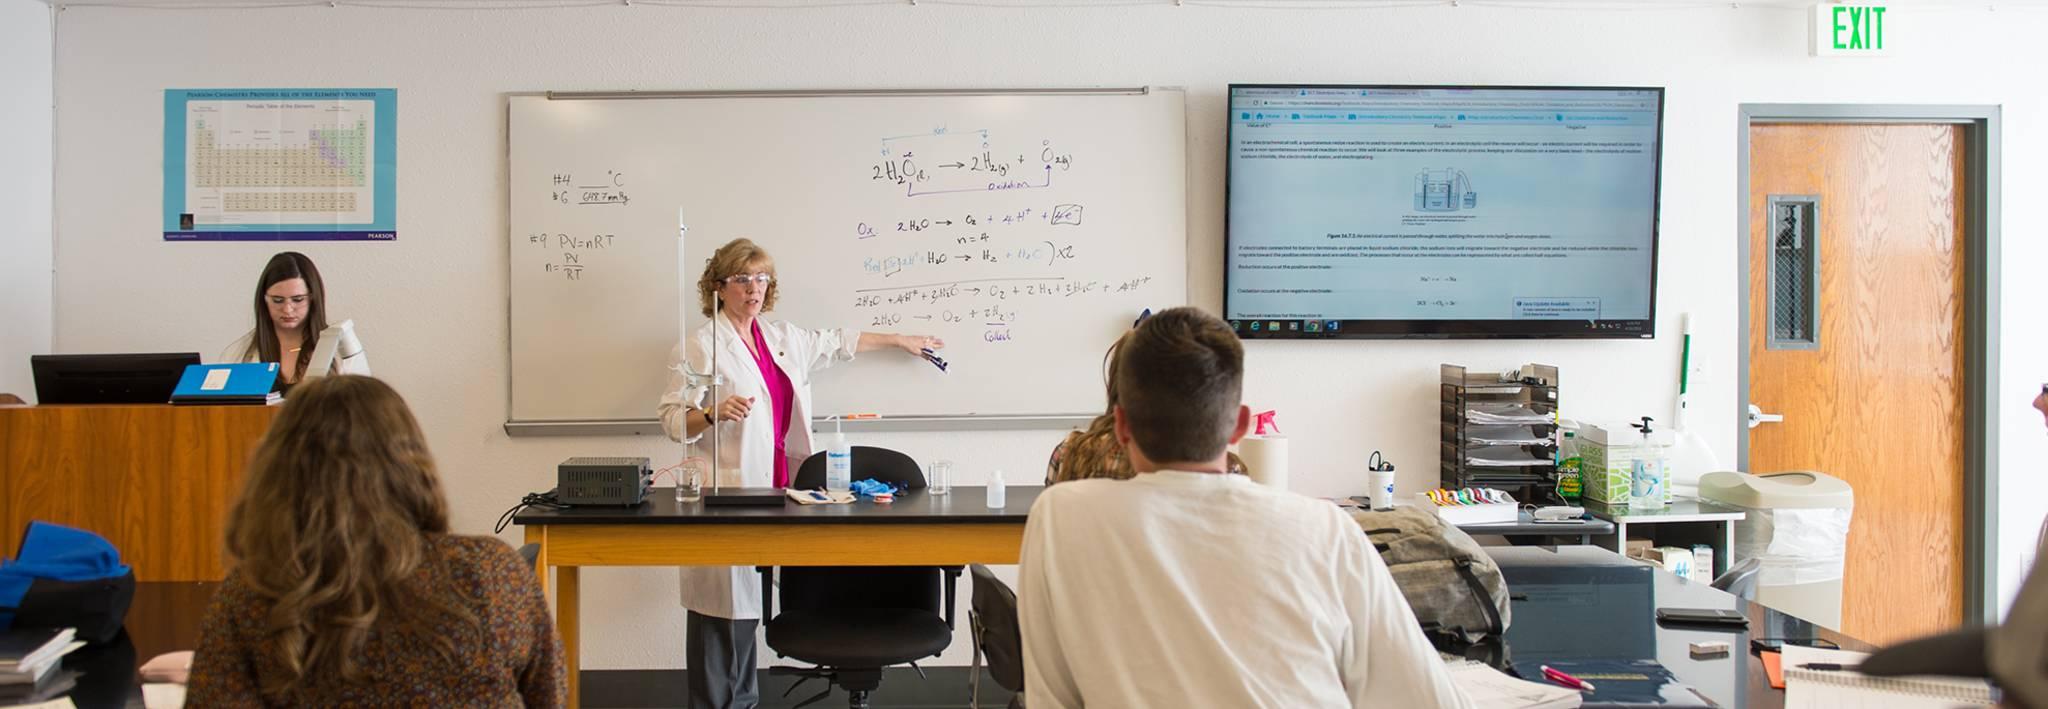 Colorado Christian University science classroom.